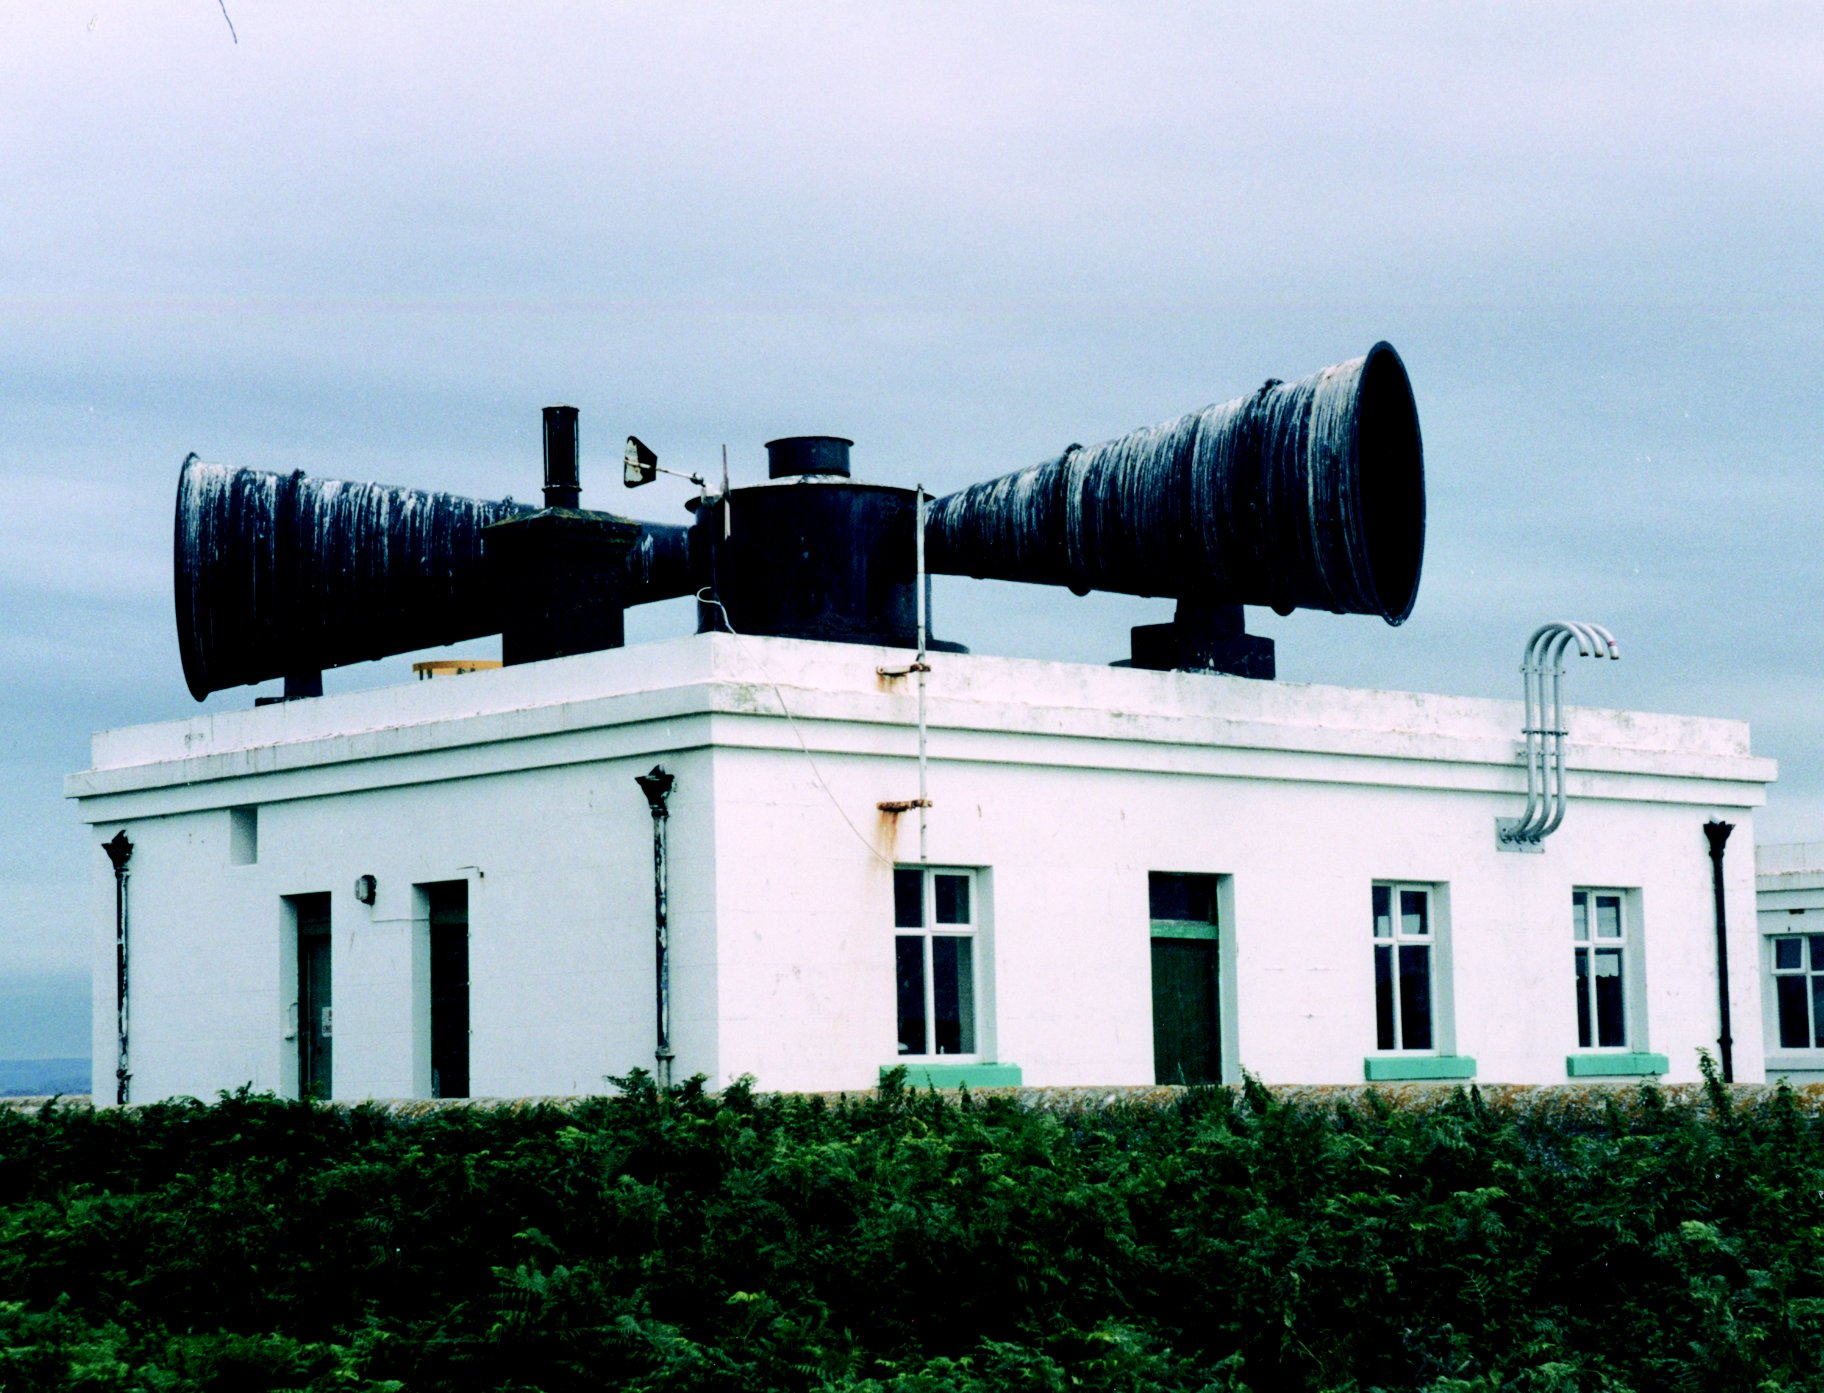 [Image: Foghorn_building_on_Flat_Holm_Island.jpg]